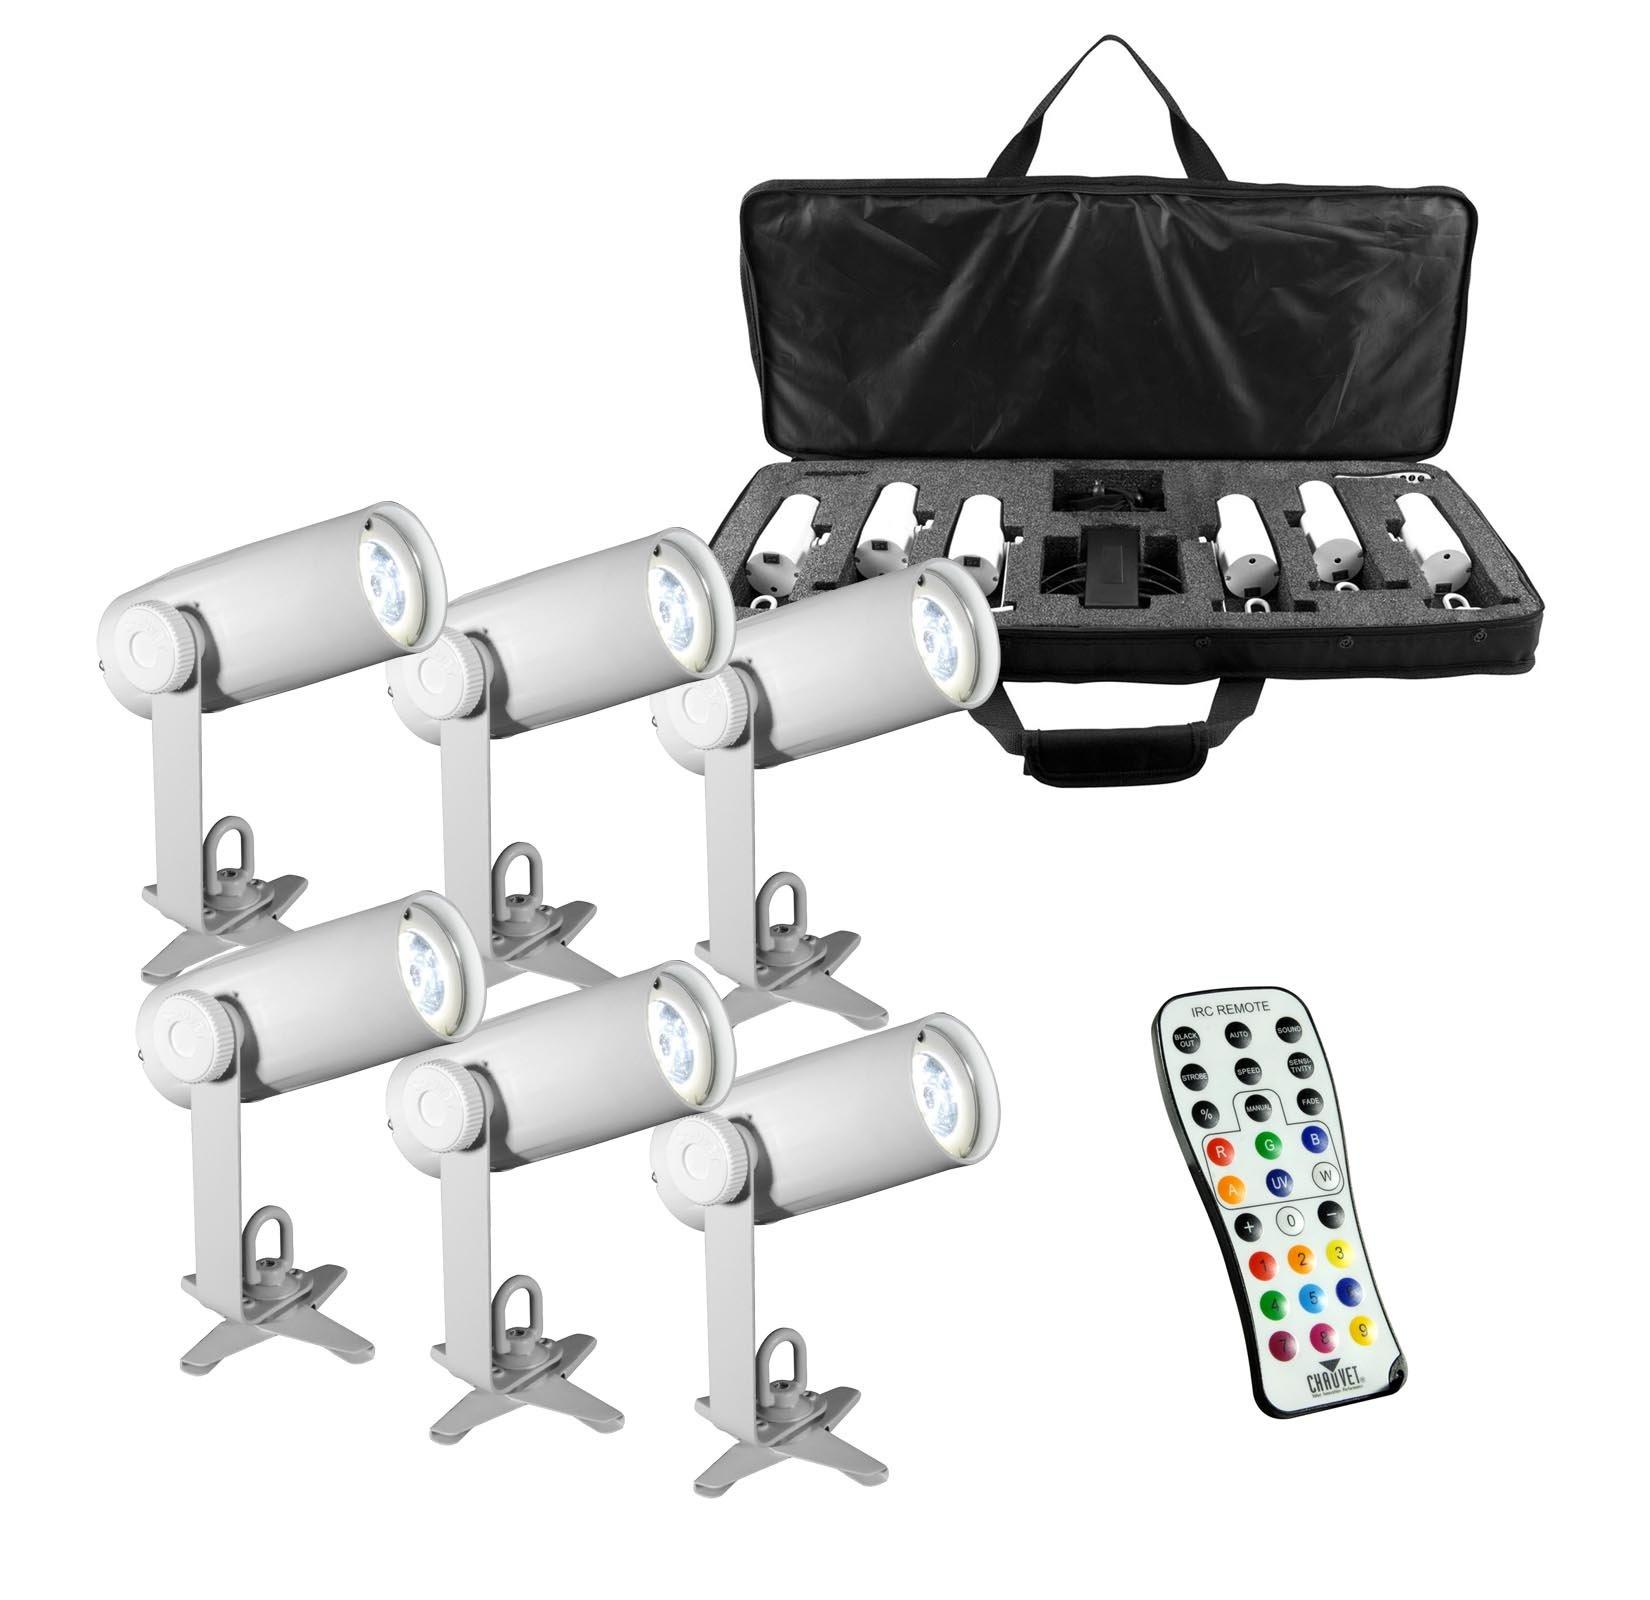 CHAUVET DJ EZpin IRC LED Pin Spot Light 6-Pack w/IRC-6 Remote & VIP Gear Bag by CHAUVET DJ